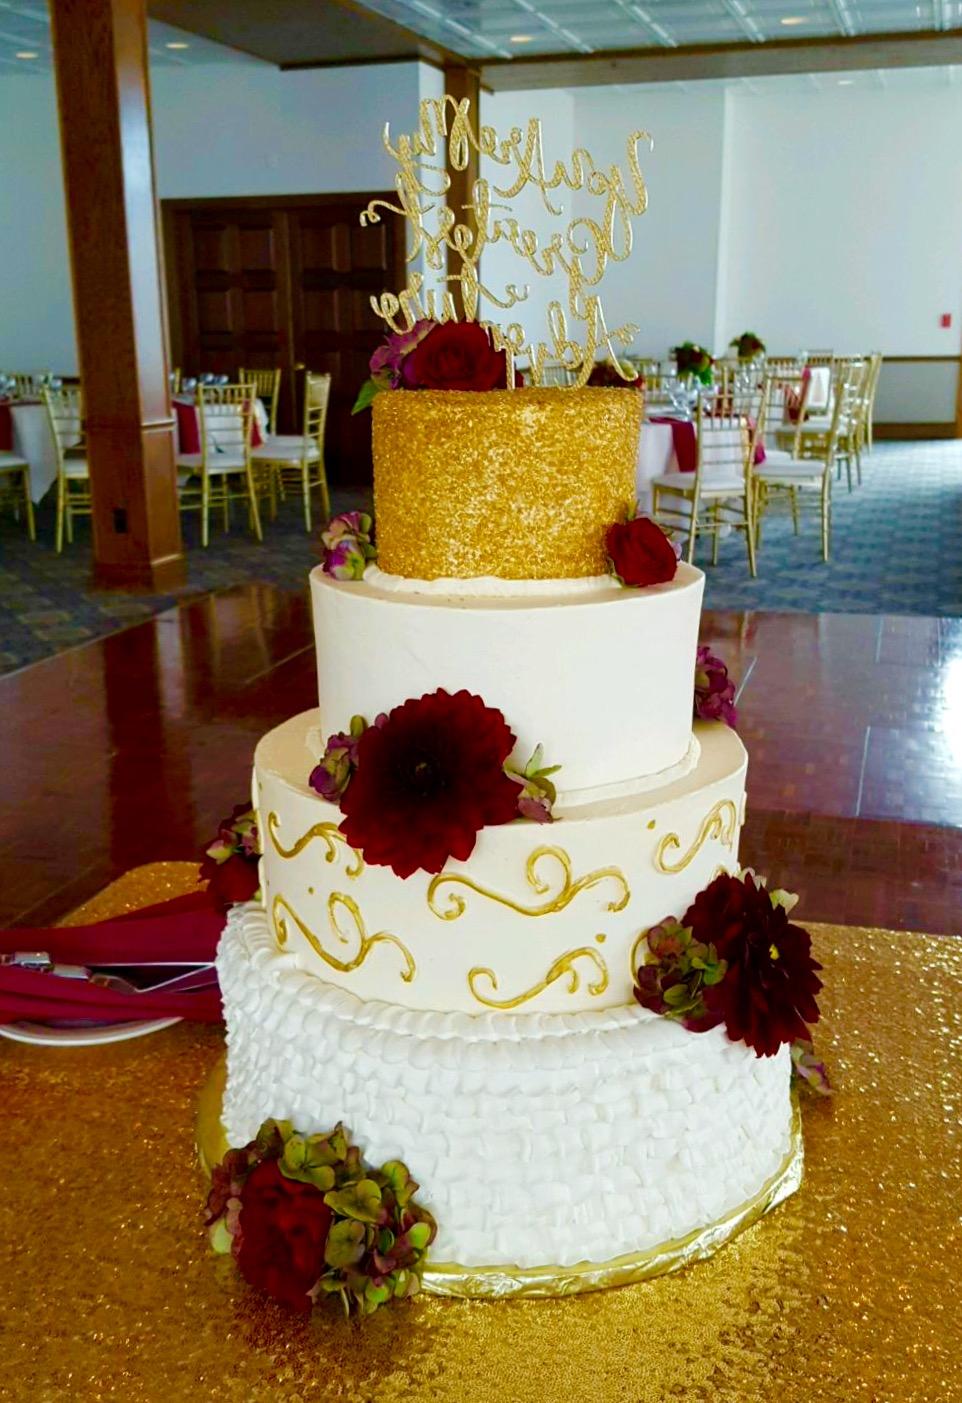 Wedding4tierBurgandyandGold.jpg